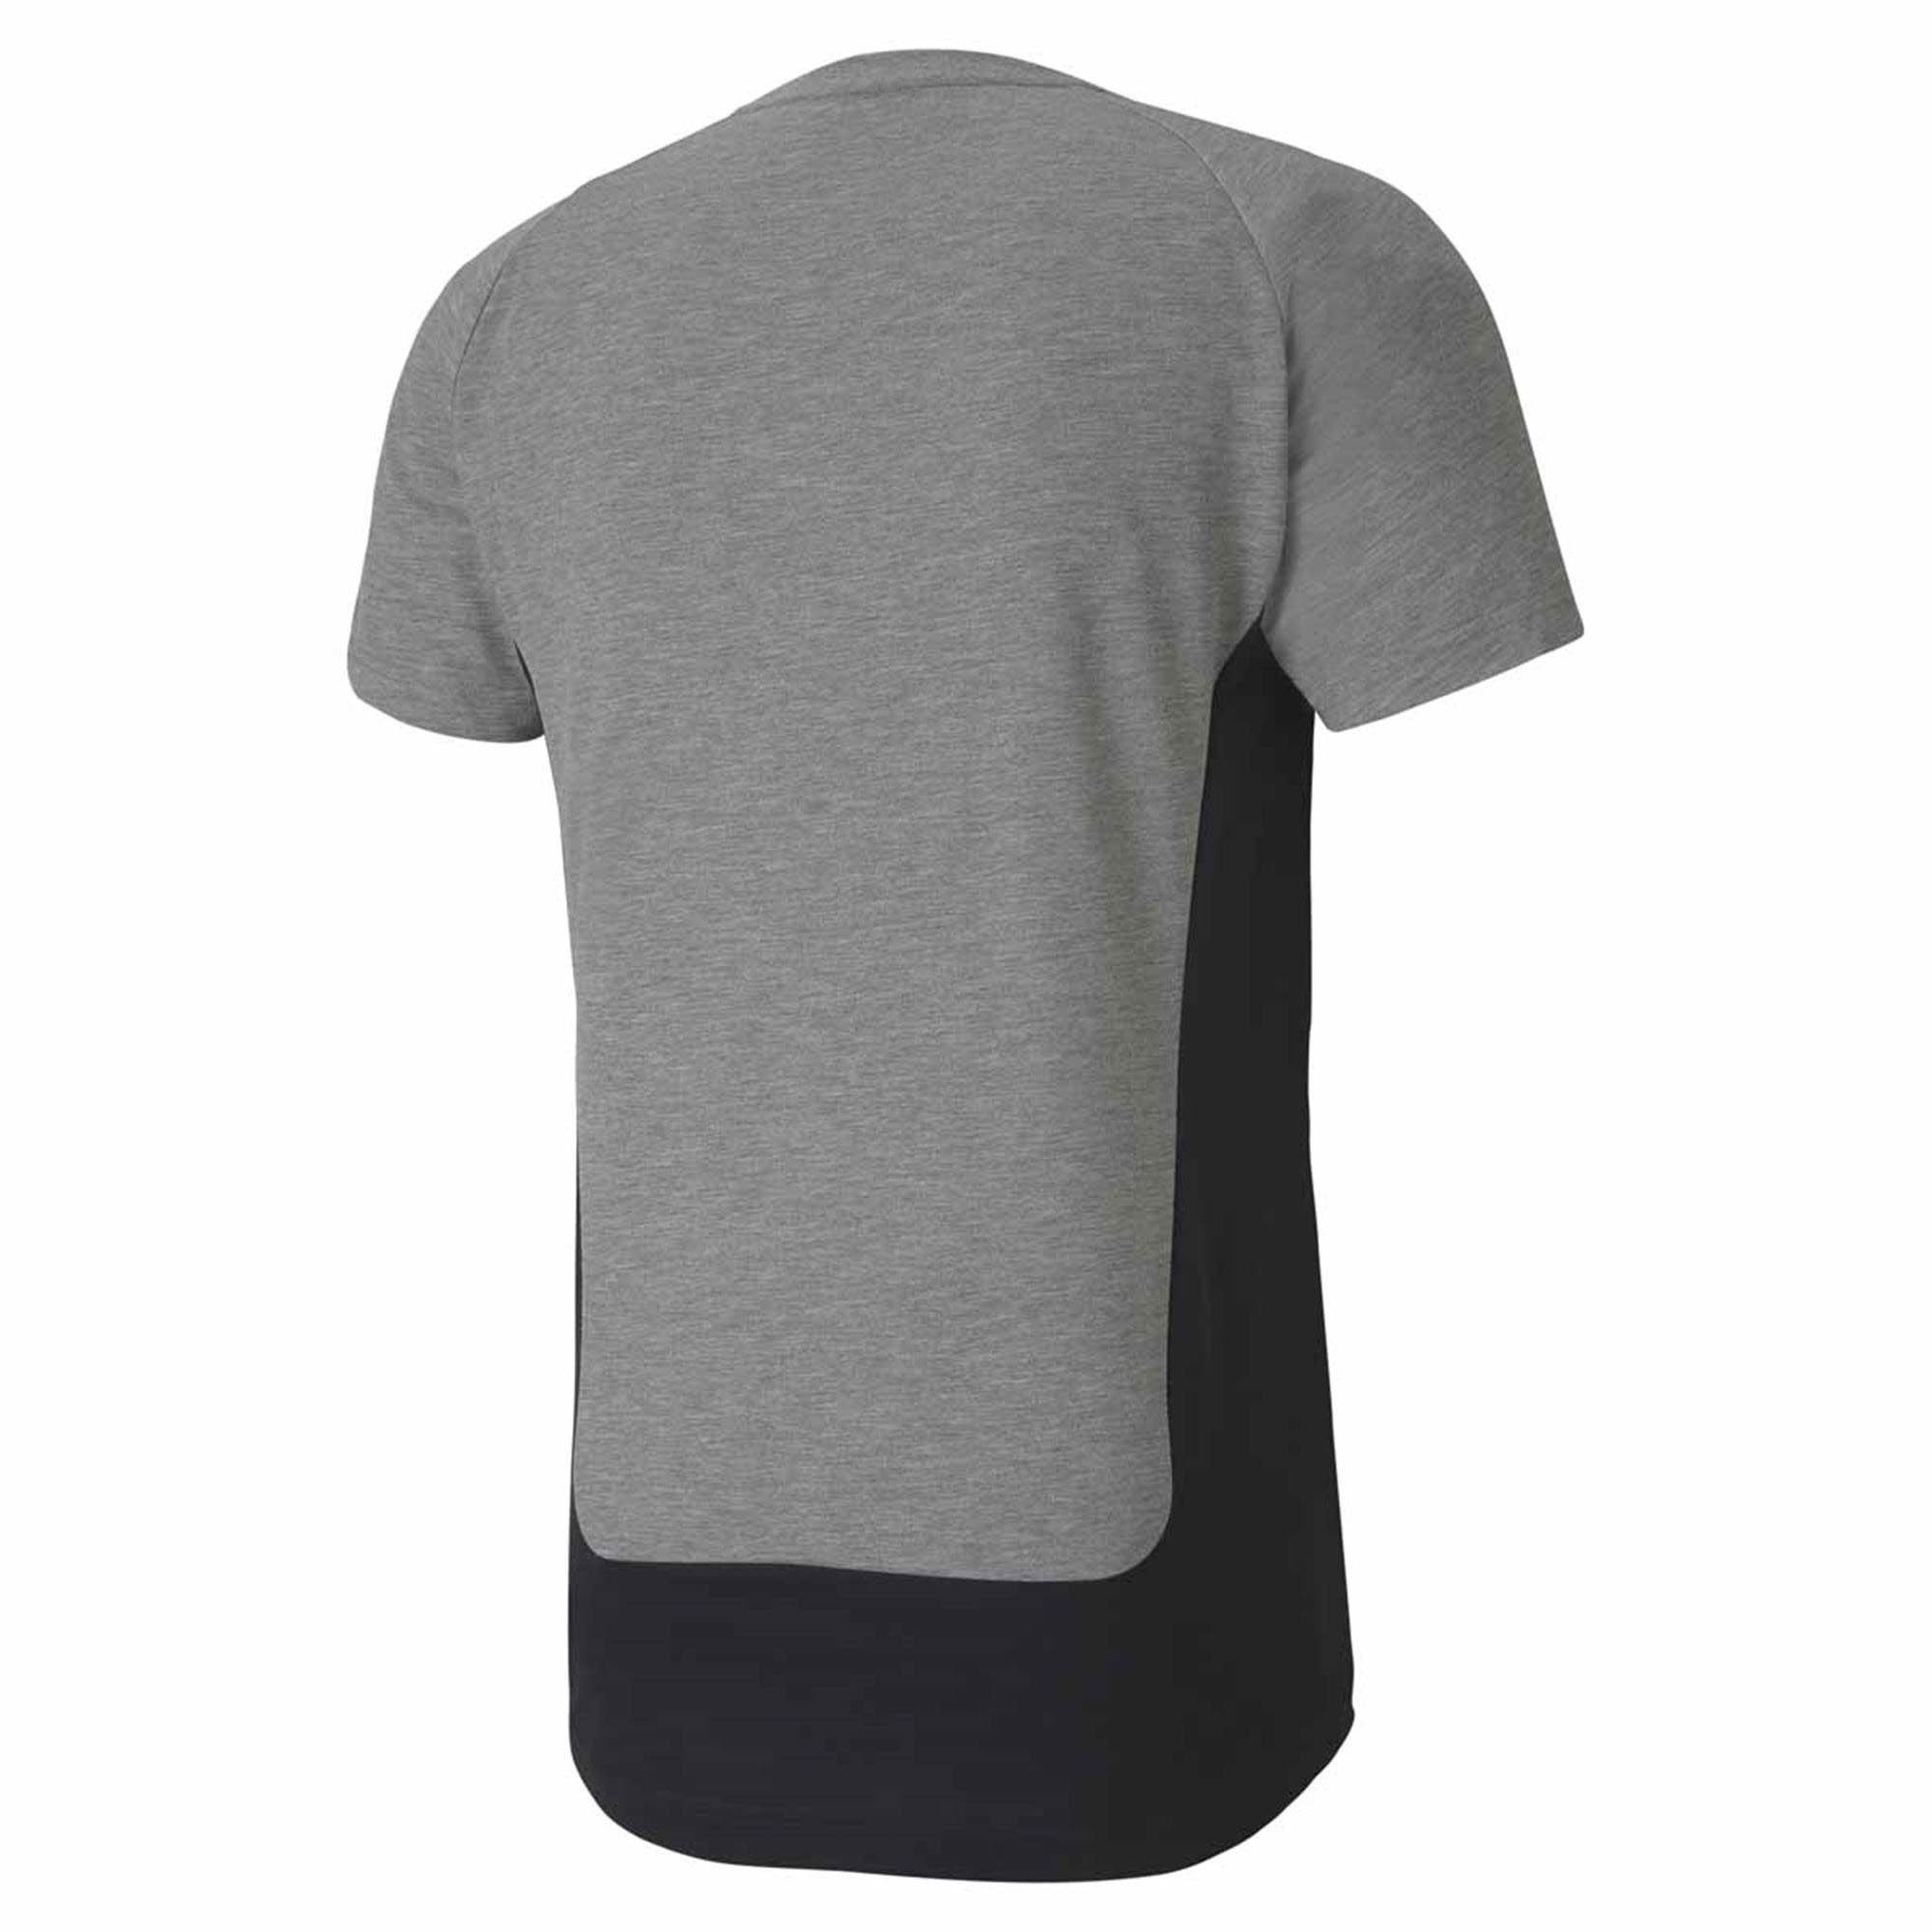 Camiseta Puma Evostripe Tee Masculina Cinza